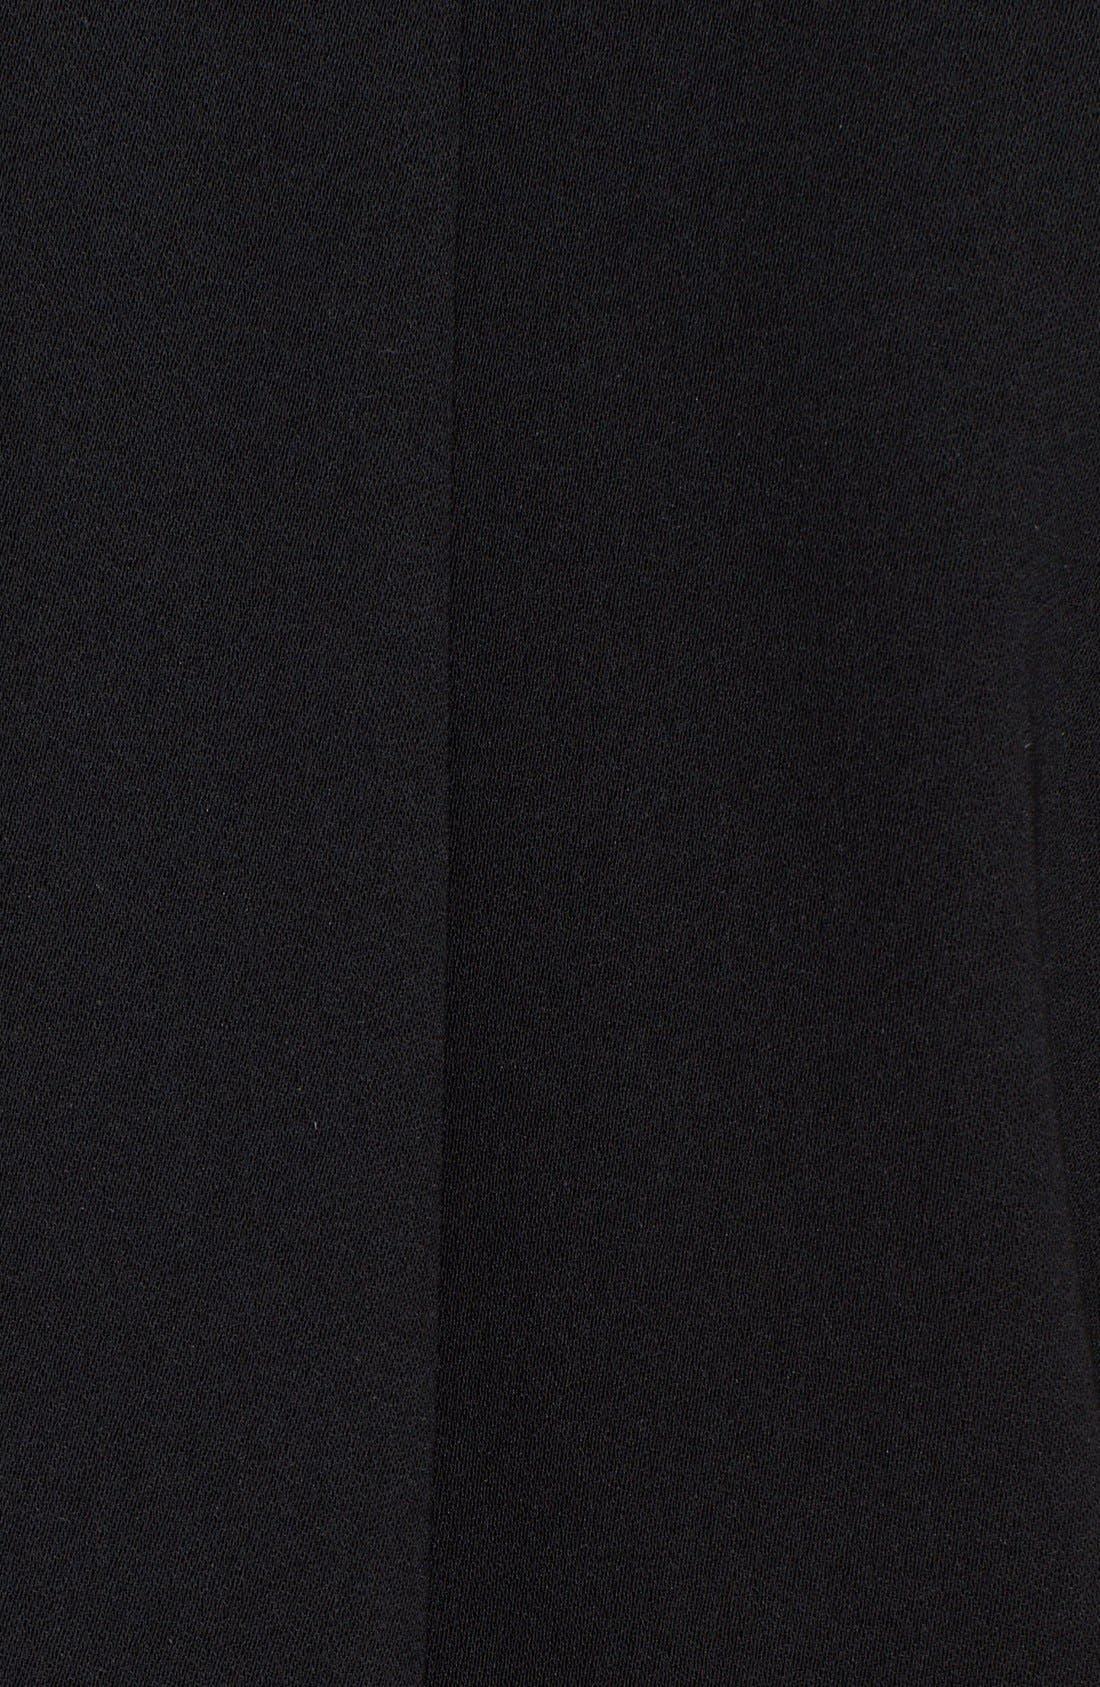 Sleeveless Jumpsuit,                             Alternate thumbnail 3, color,                             Black